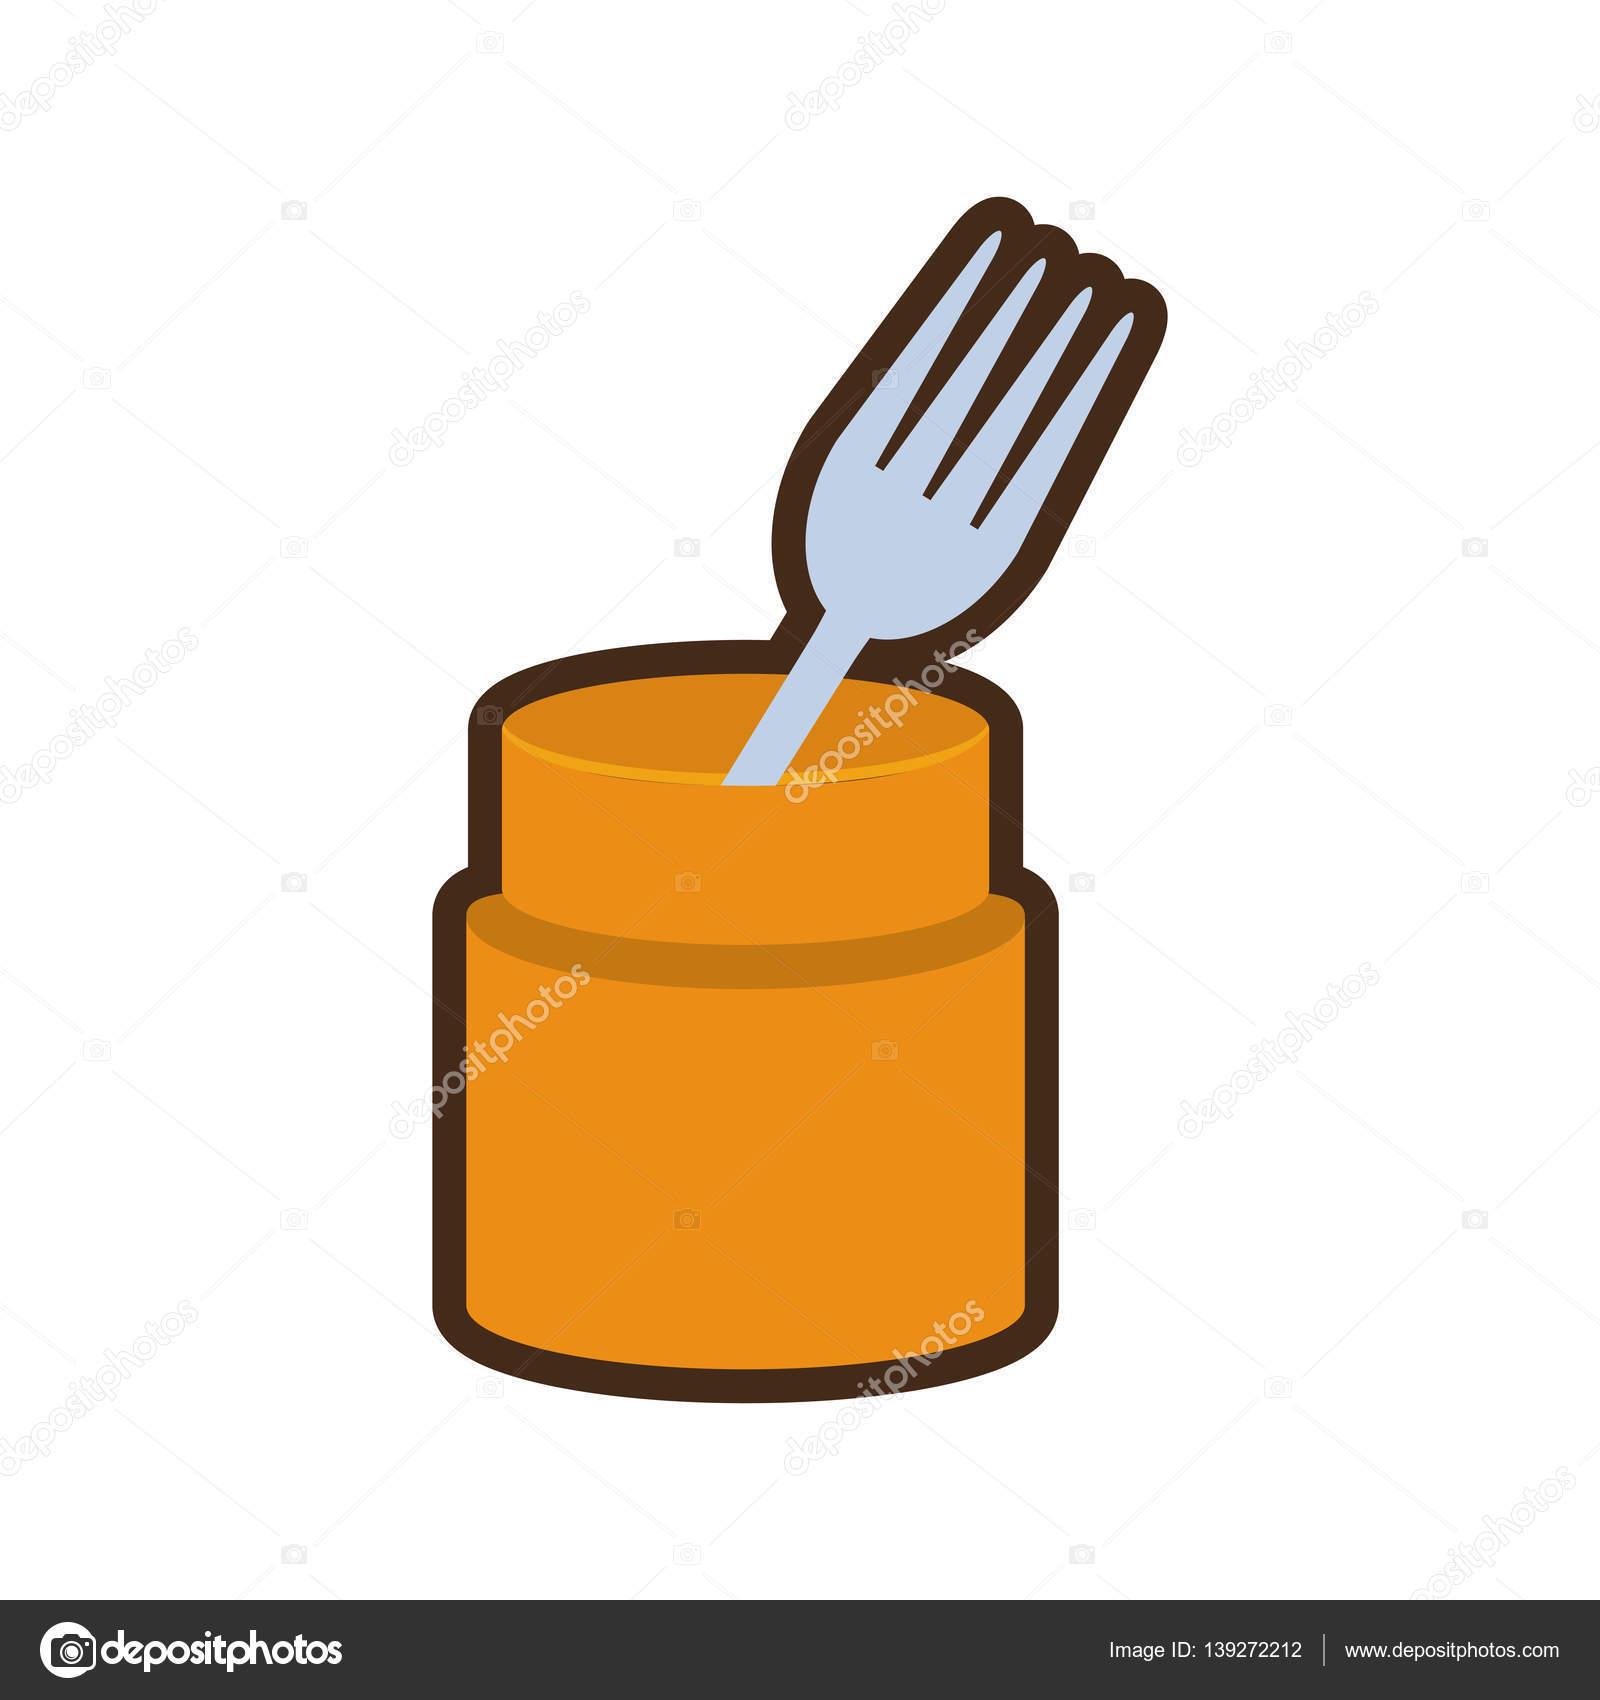 kitchen fork aide blender 卡通叉容器用具厨房 图库矢量图像 c djv 139272212 图库矢量图片